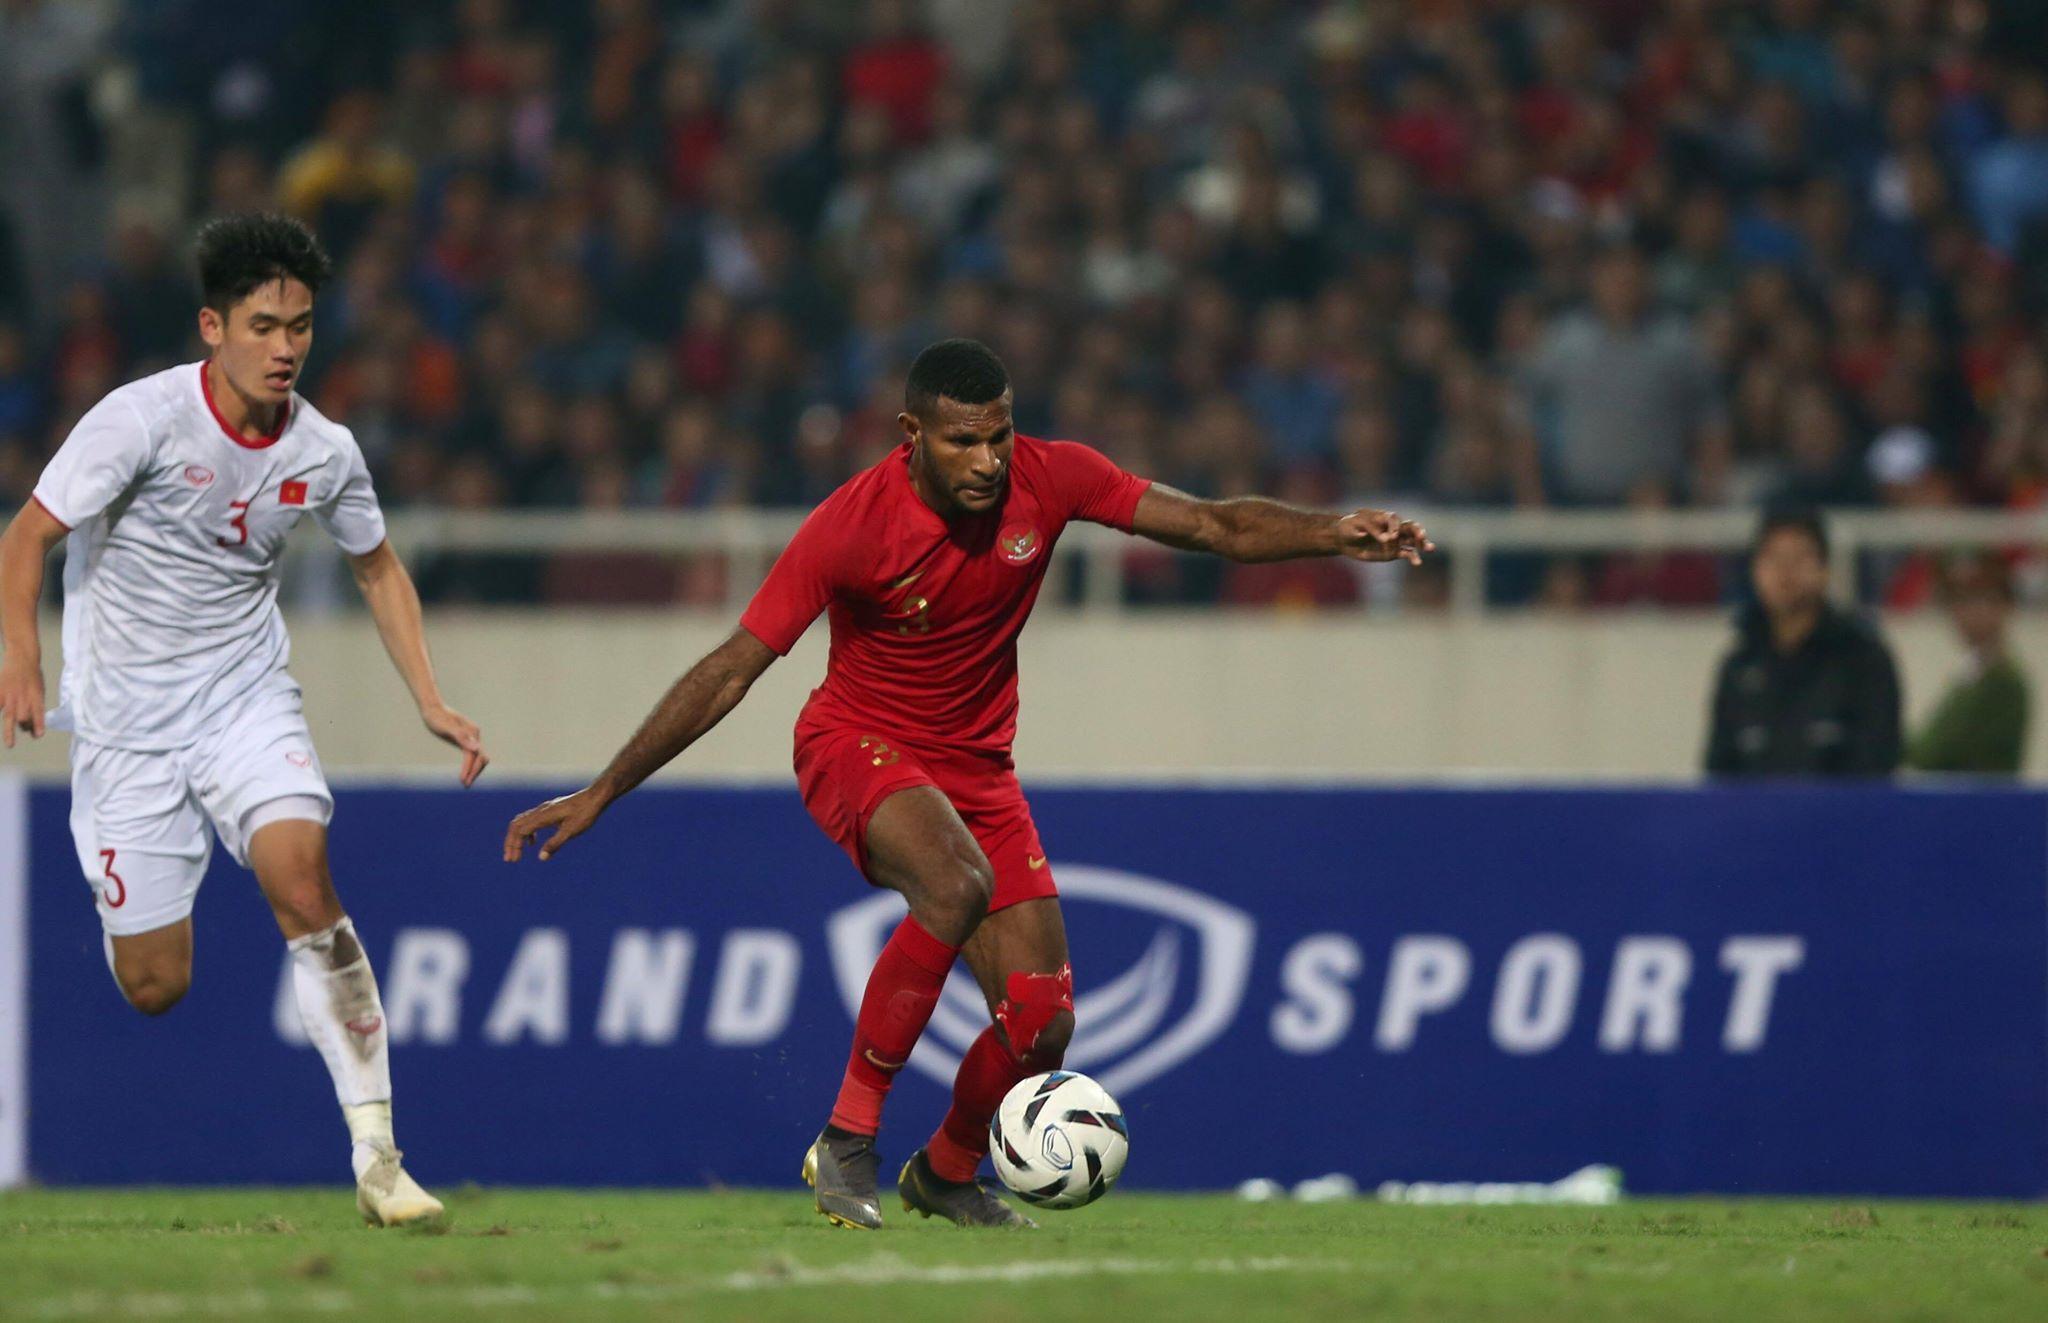 Marinus Wanewar U23 Indonesia AFC U23 Championship 2020 Qualifiers